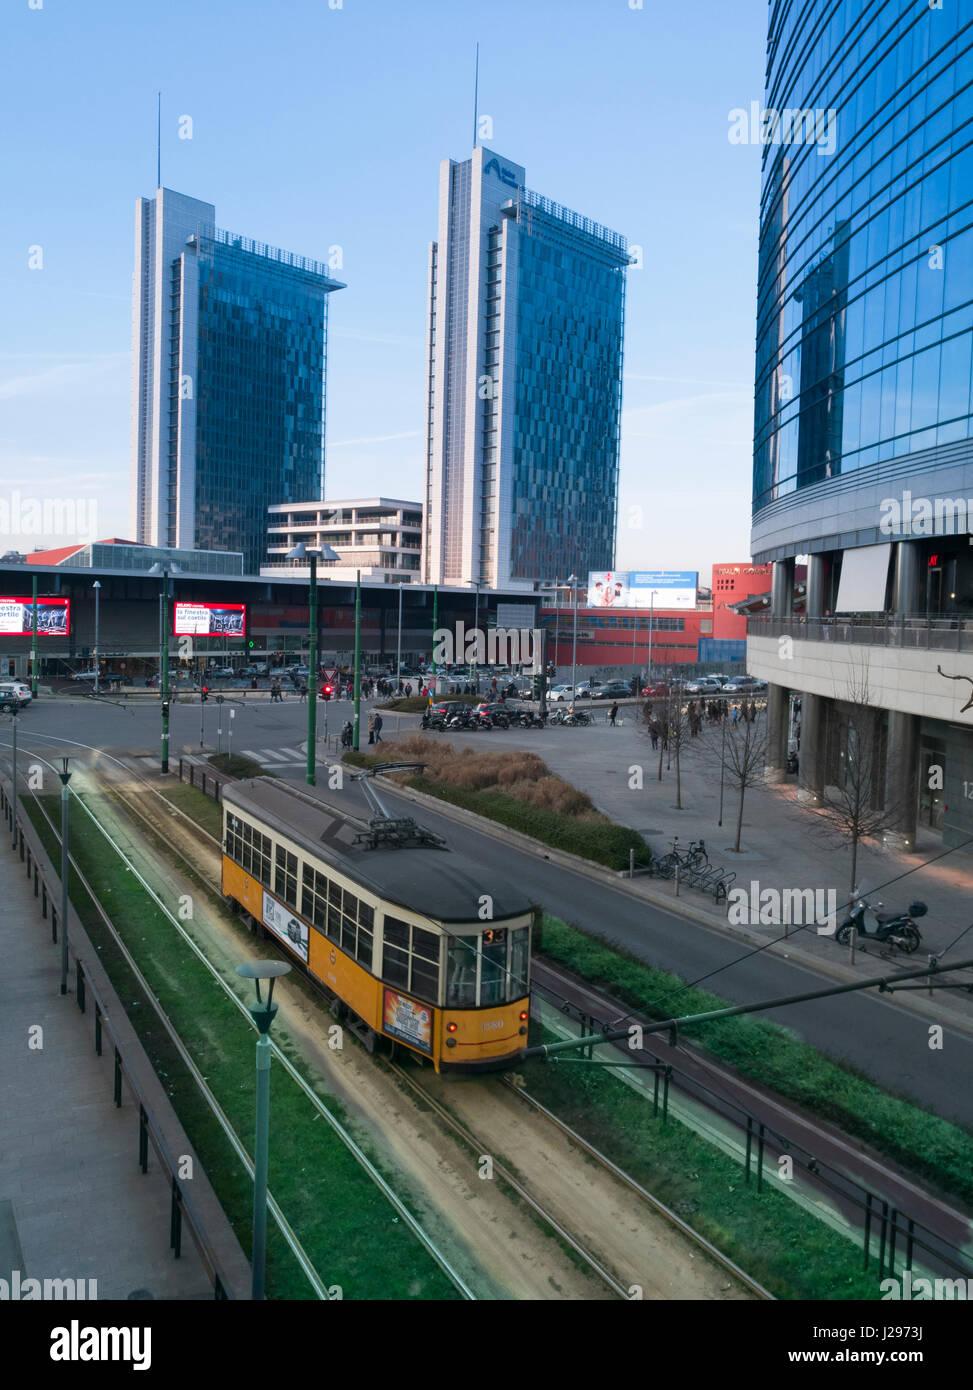 Milano porta garibaldi stock photos milano porta - Milano porta garibaldi station ...